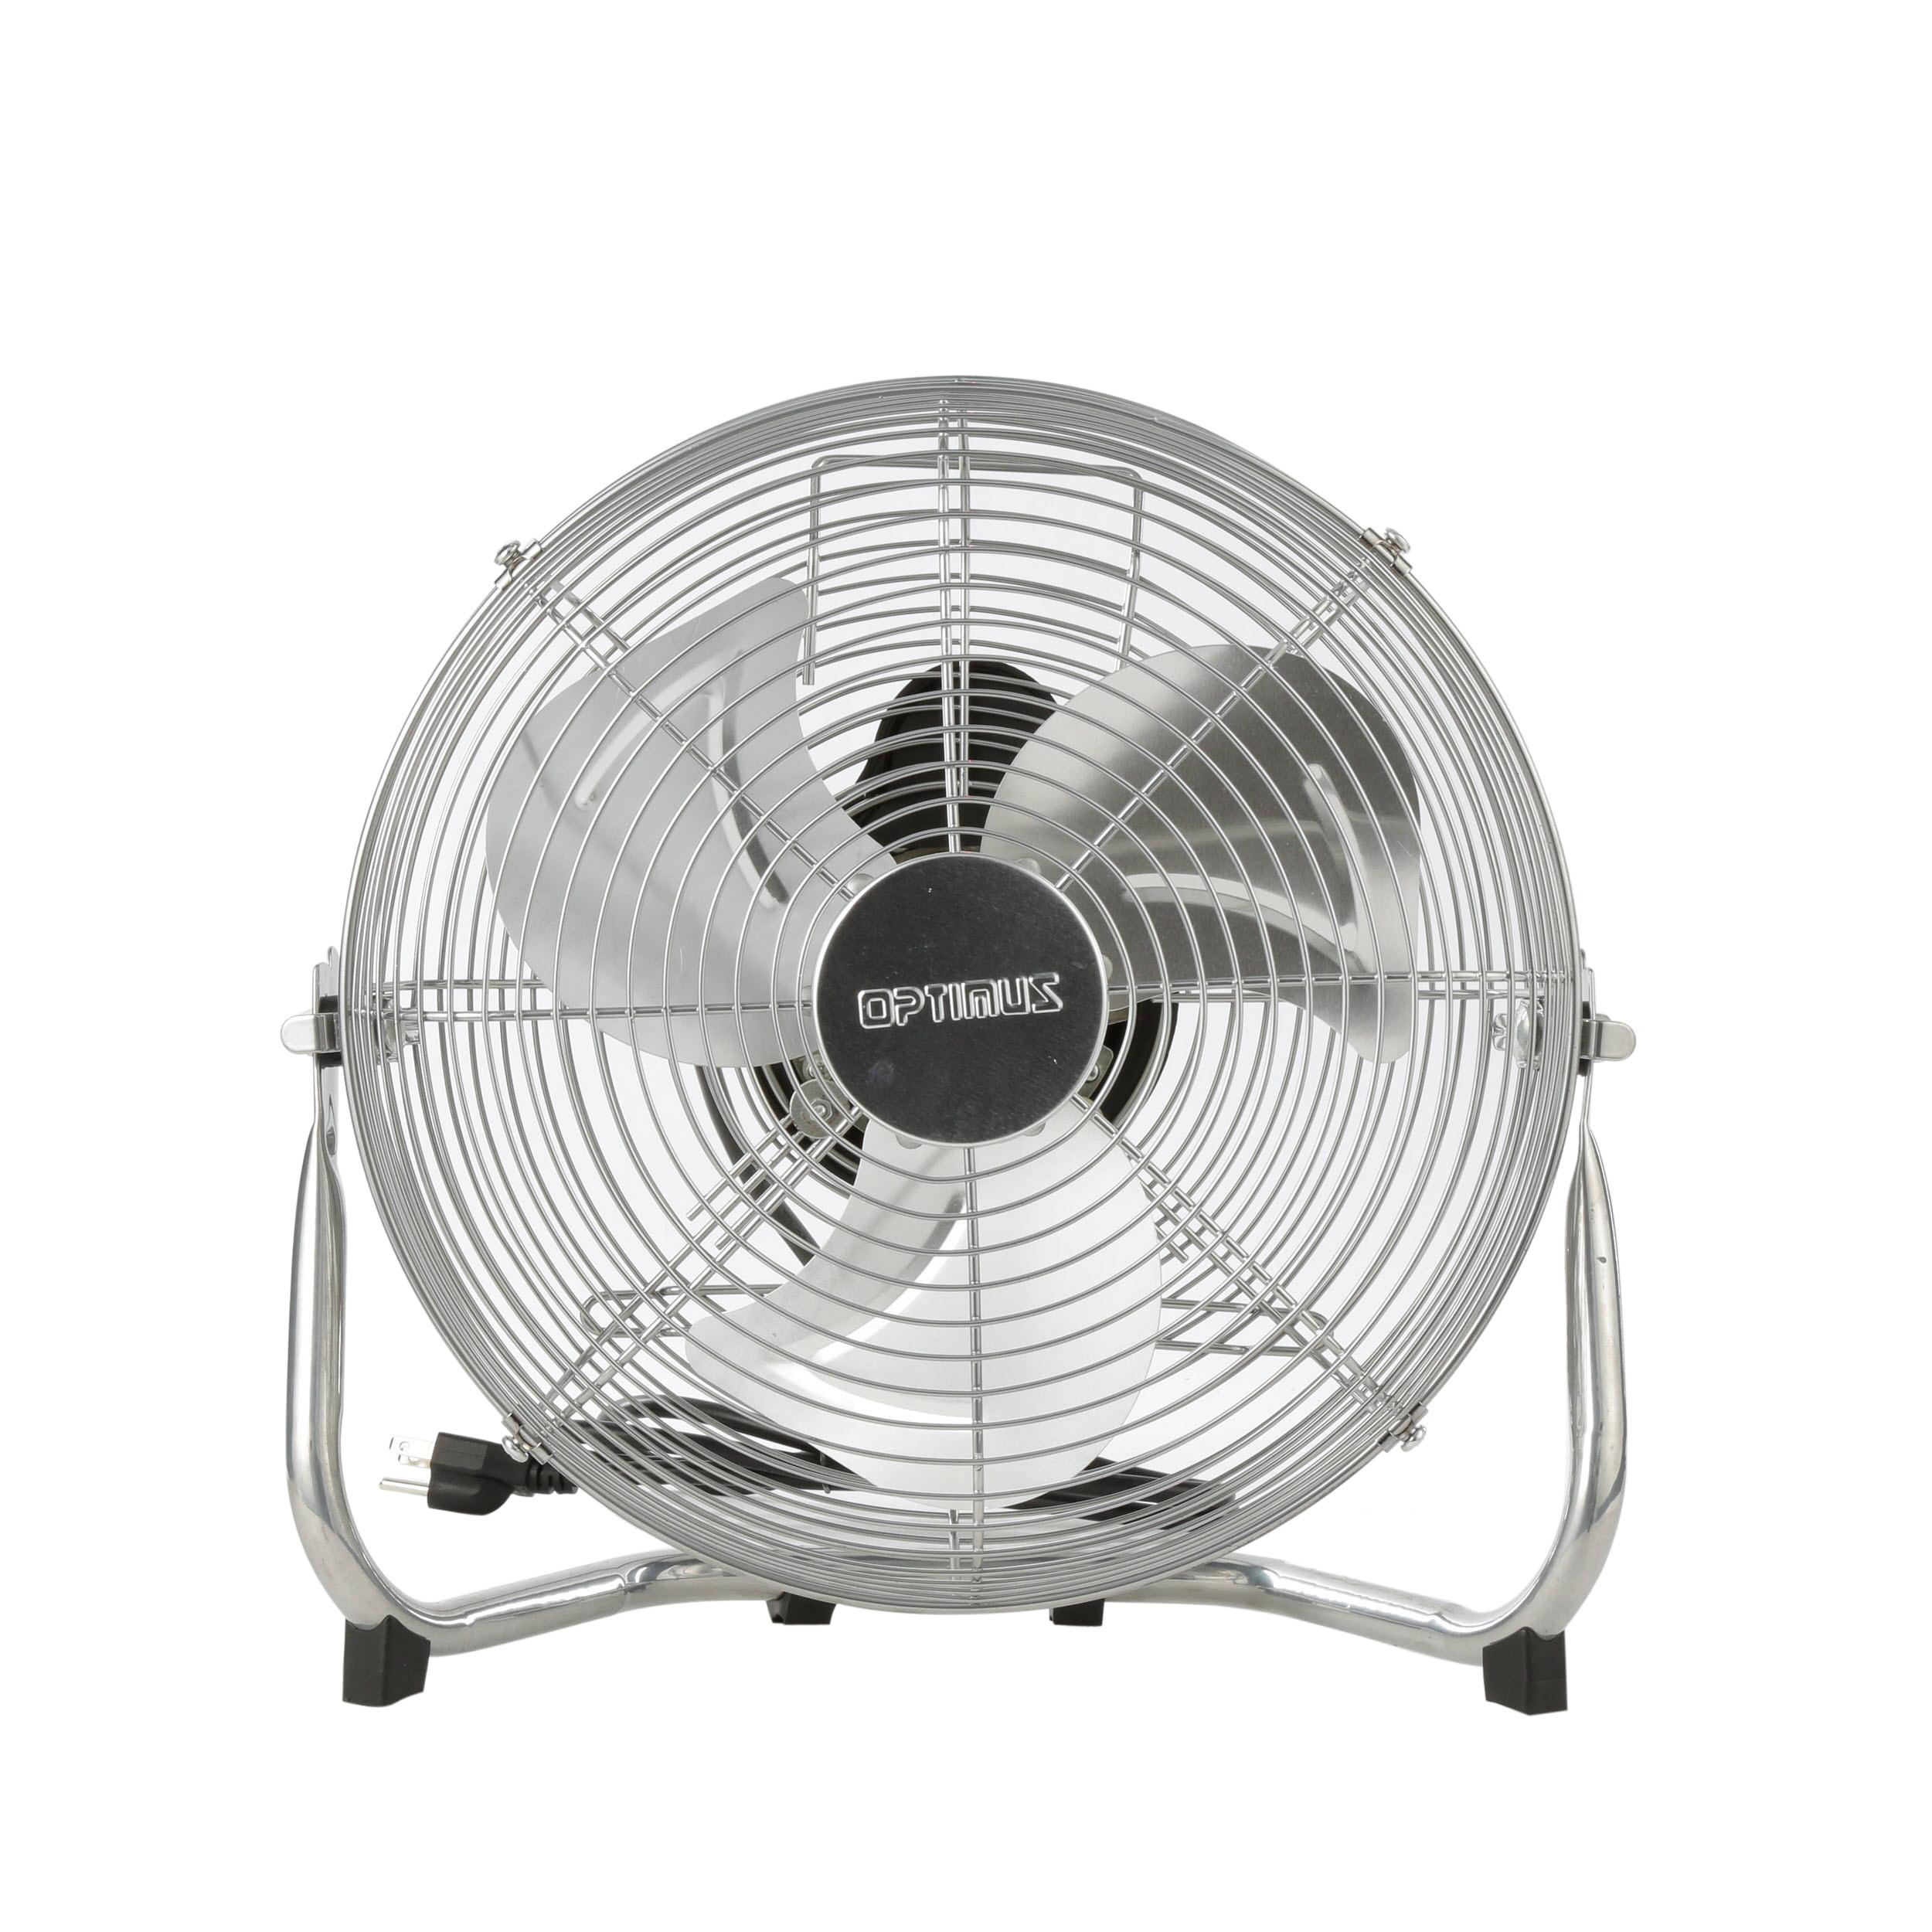 "Optimus 12"" Industrial Grade High Velocity 3-Speed Fan, Model #F-4122, White"